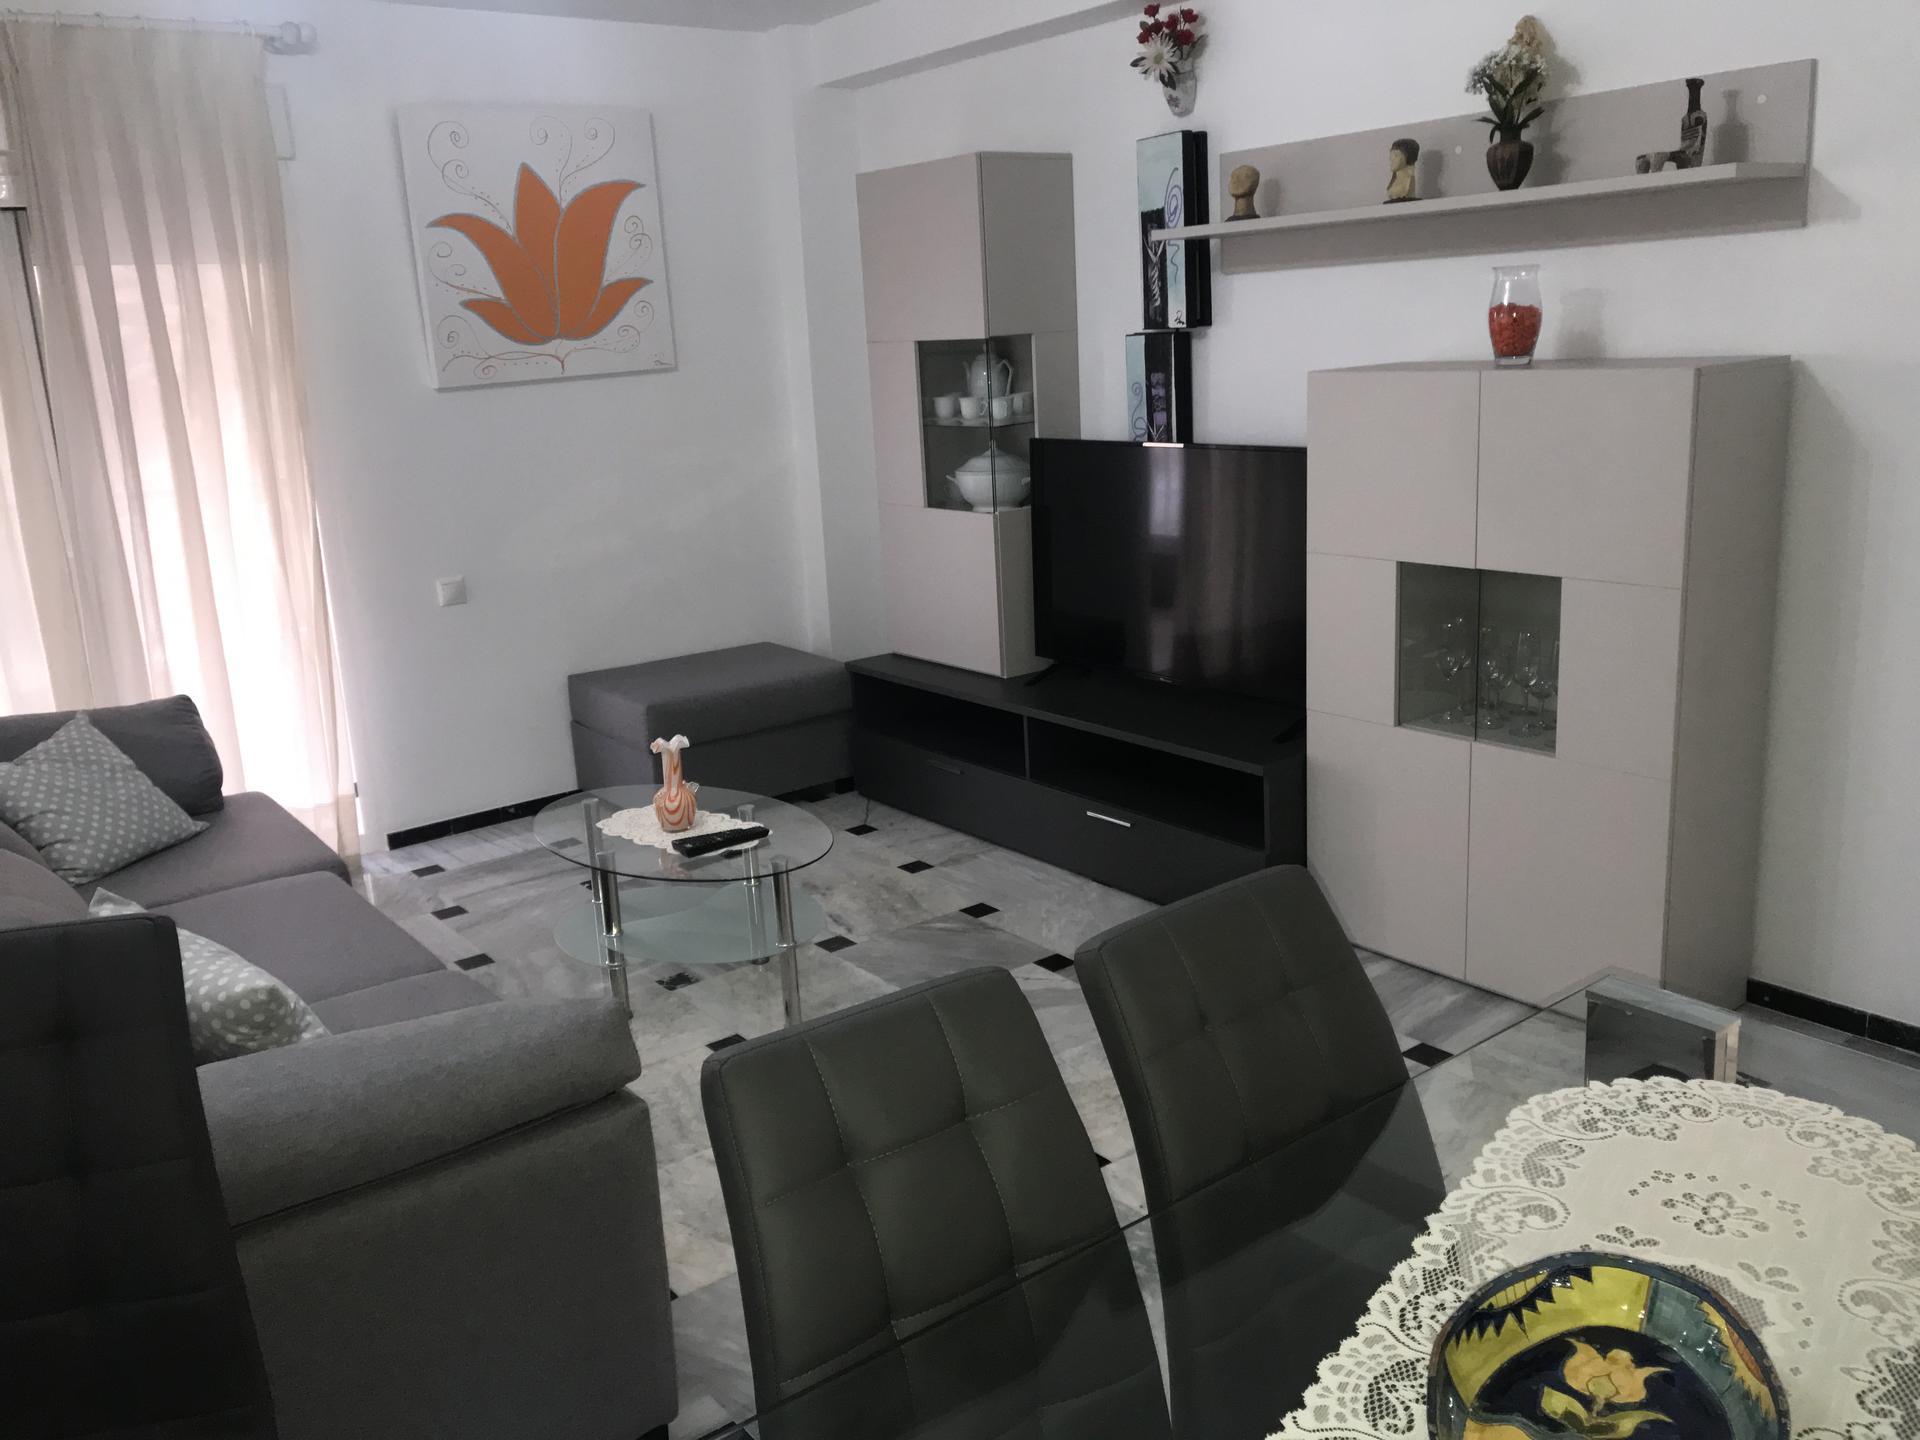 Piso -                                       Benidorm -                                       3 dormitorios -                                       6 ocupantes